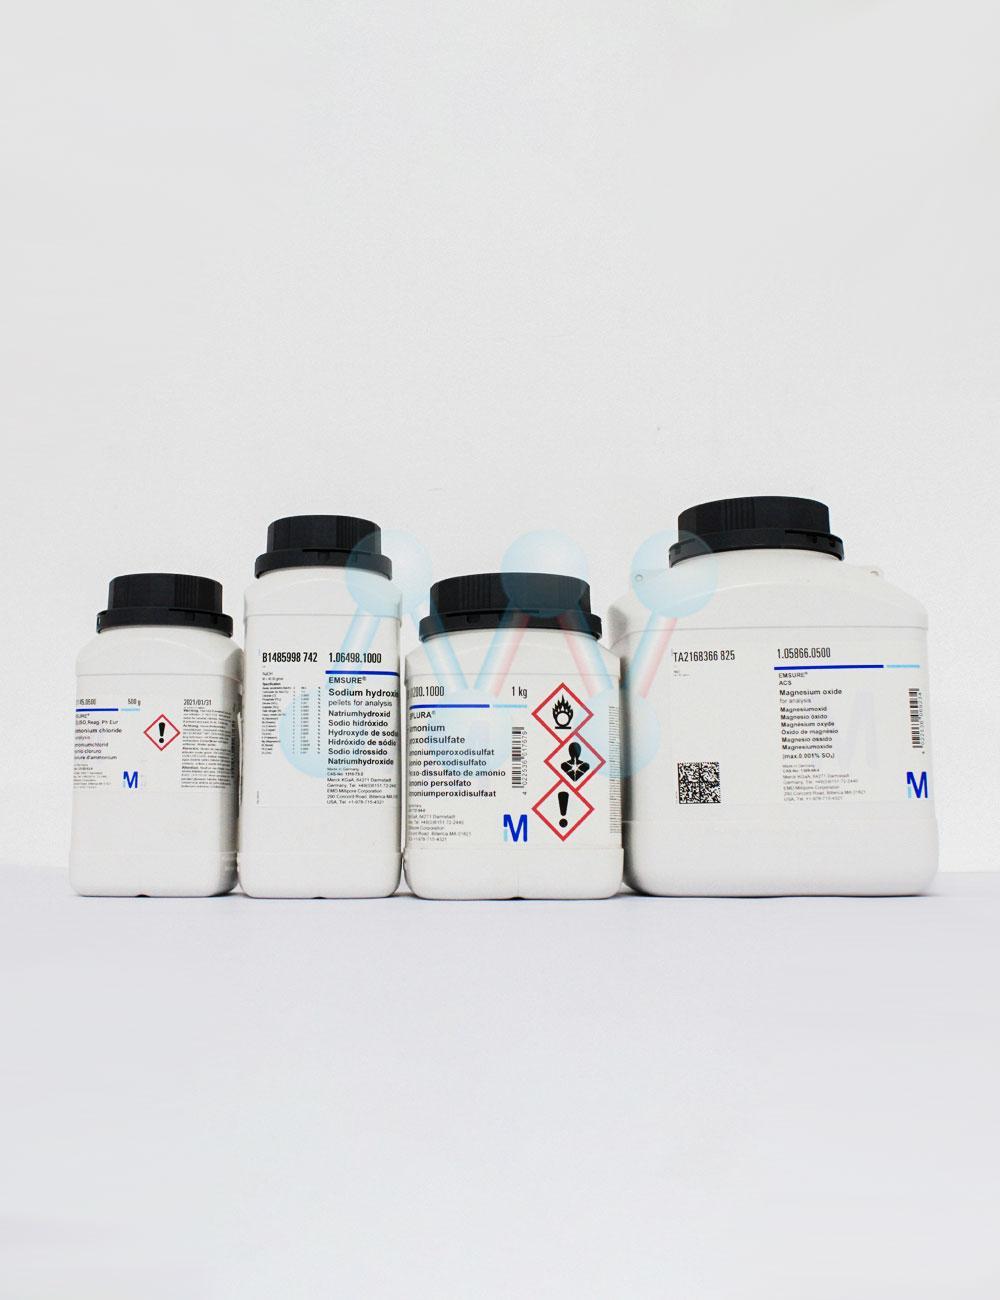 Sodium salicylate C7H5NaO3